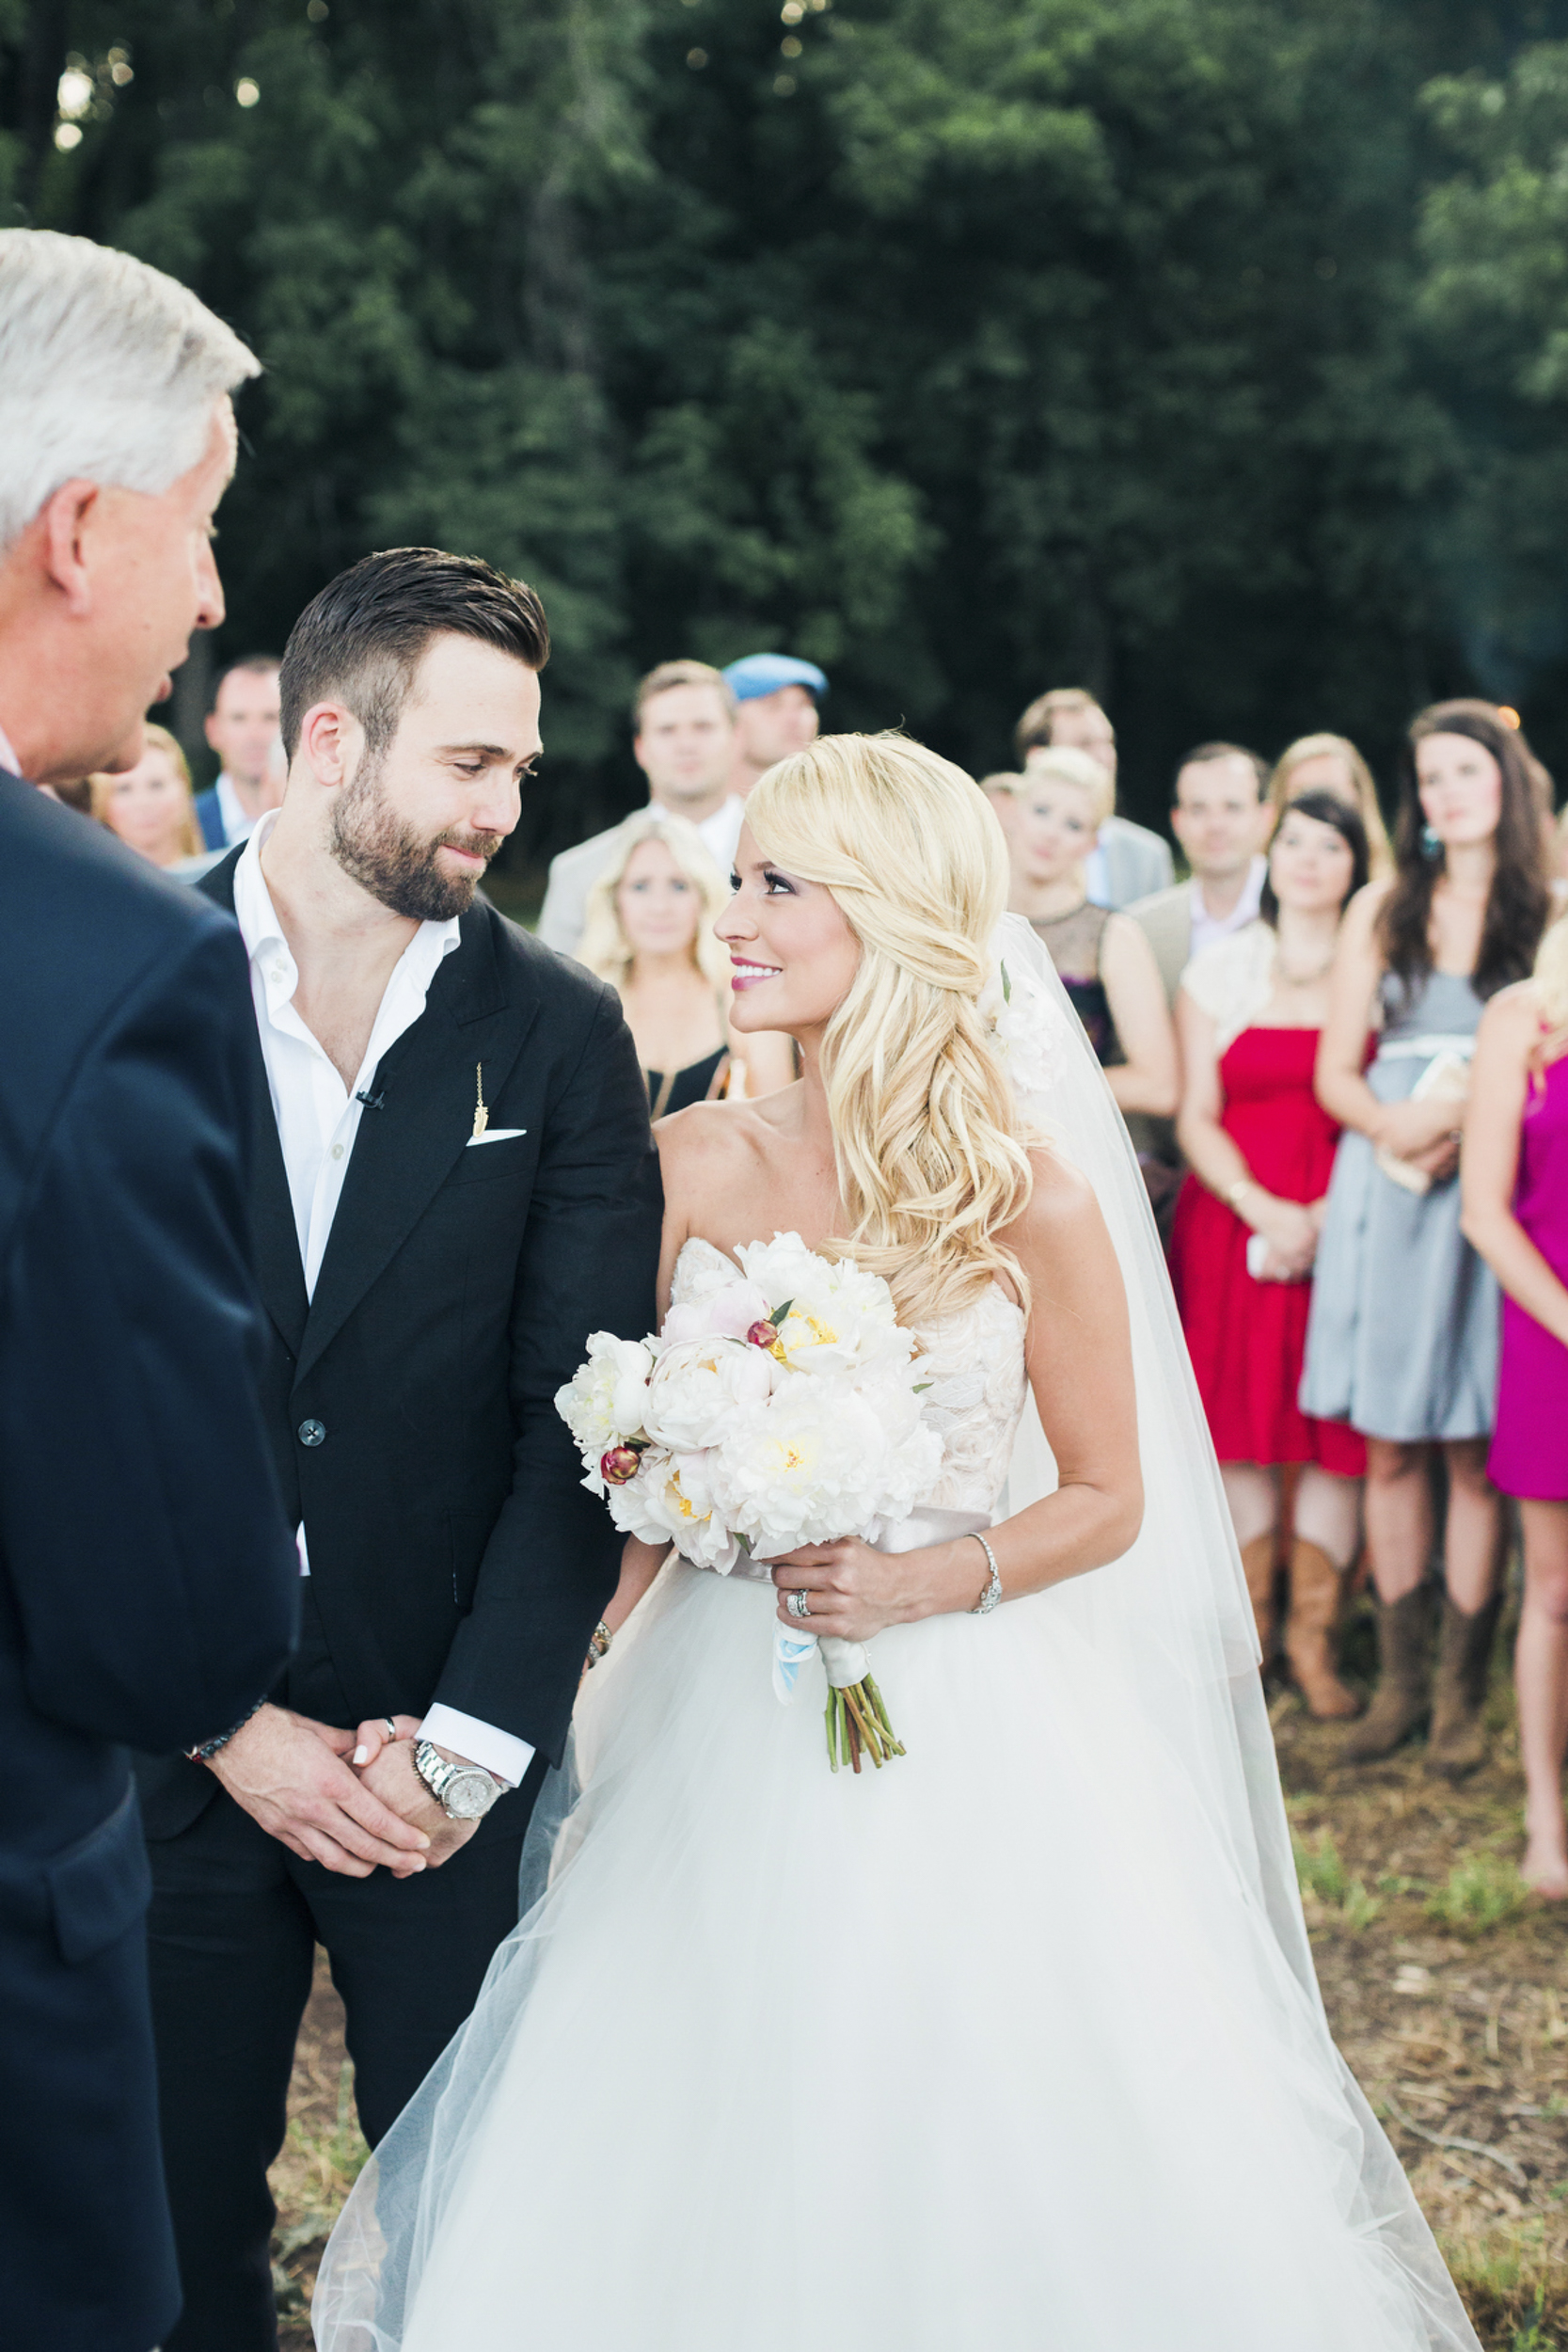 south_carolina_farm_wedding_rustic_chic_surprise_secret_luxe_wedding_bachelorette_emily_maynard_real_weddings-36.jpg